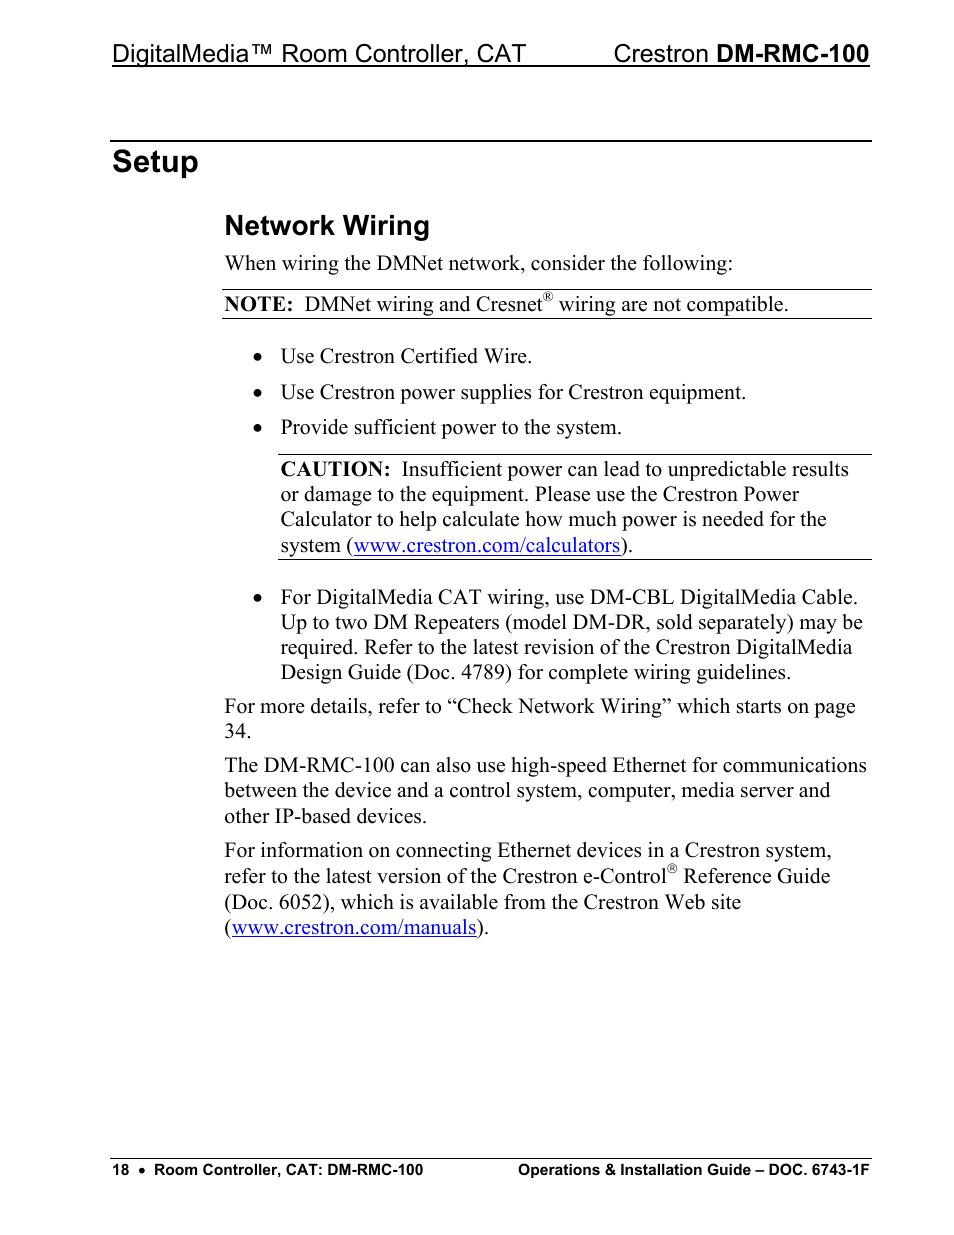 medium resolution of setup network wiring crestron electronic digitalmedia room controller dm rmc 100 user manual page 22 44